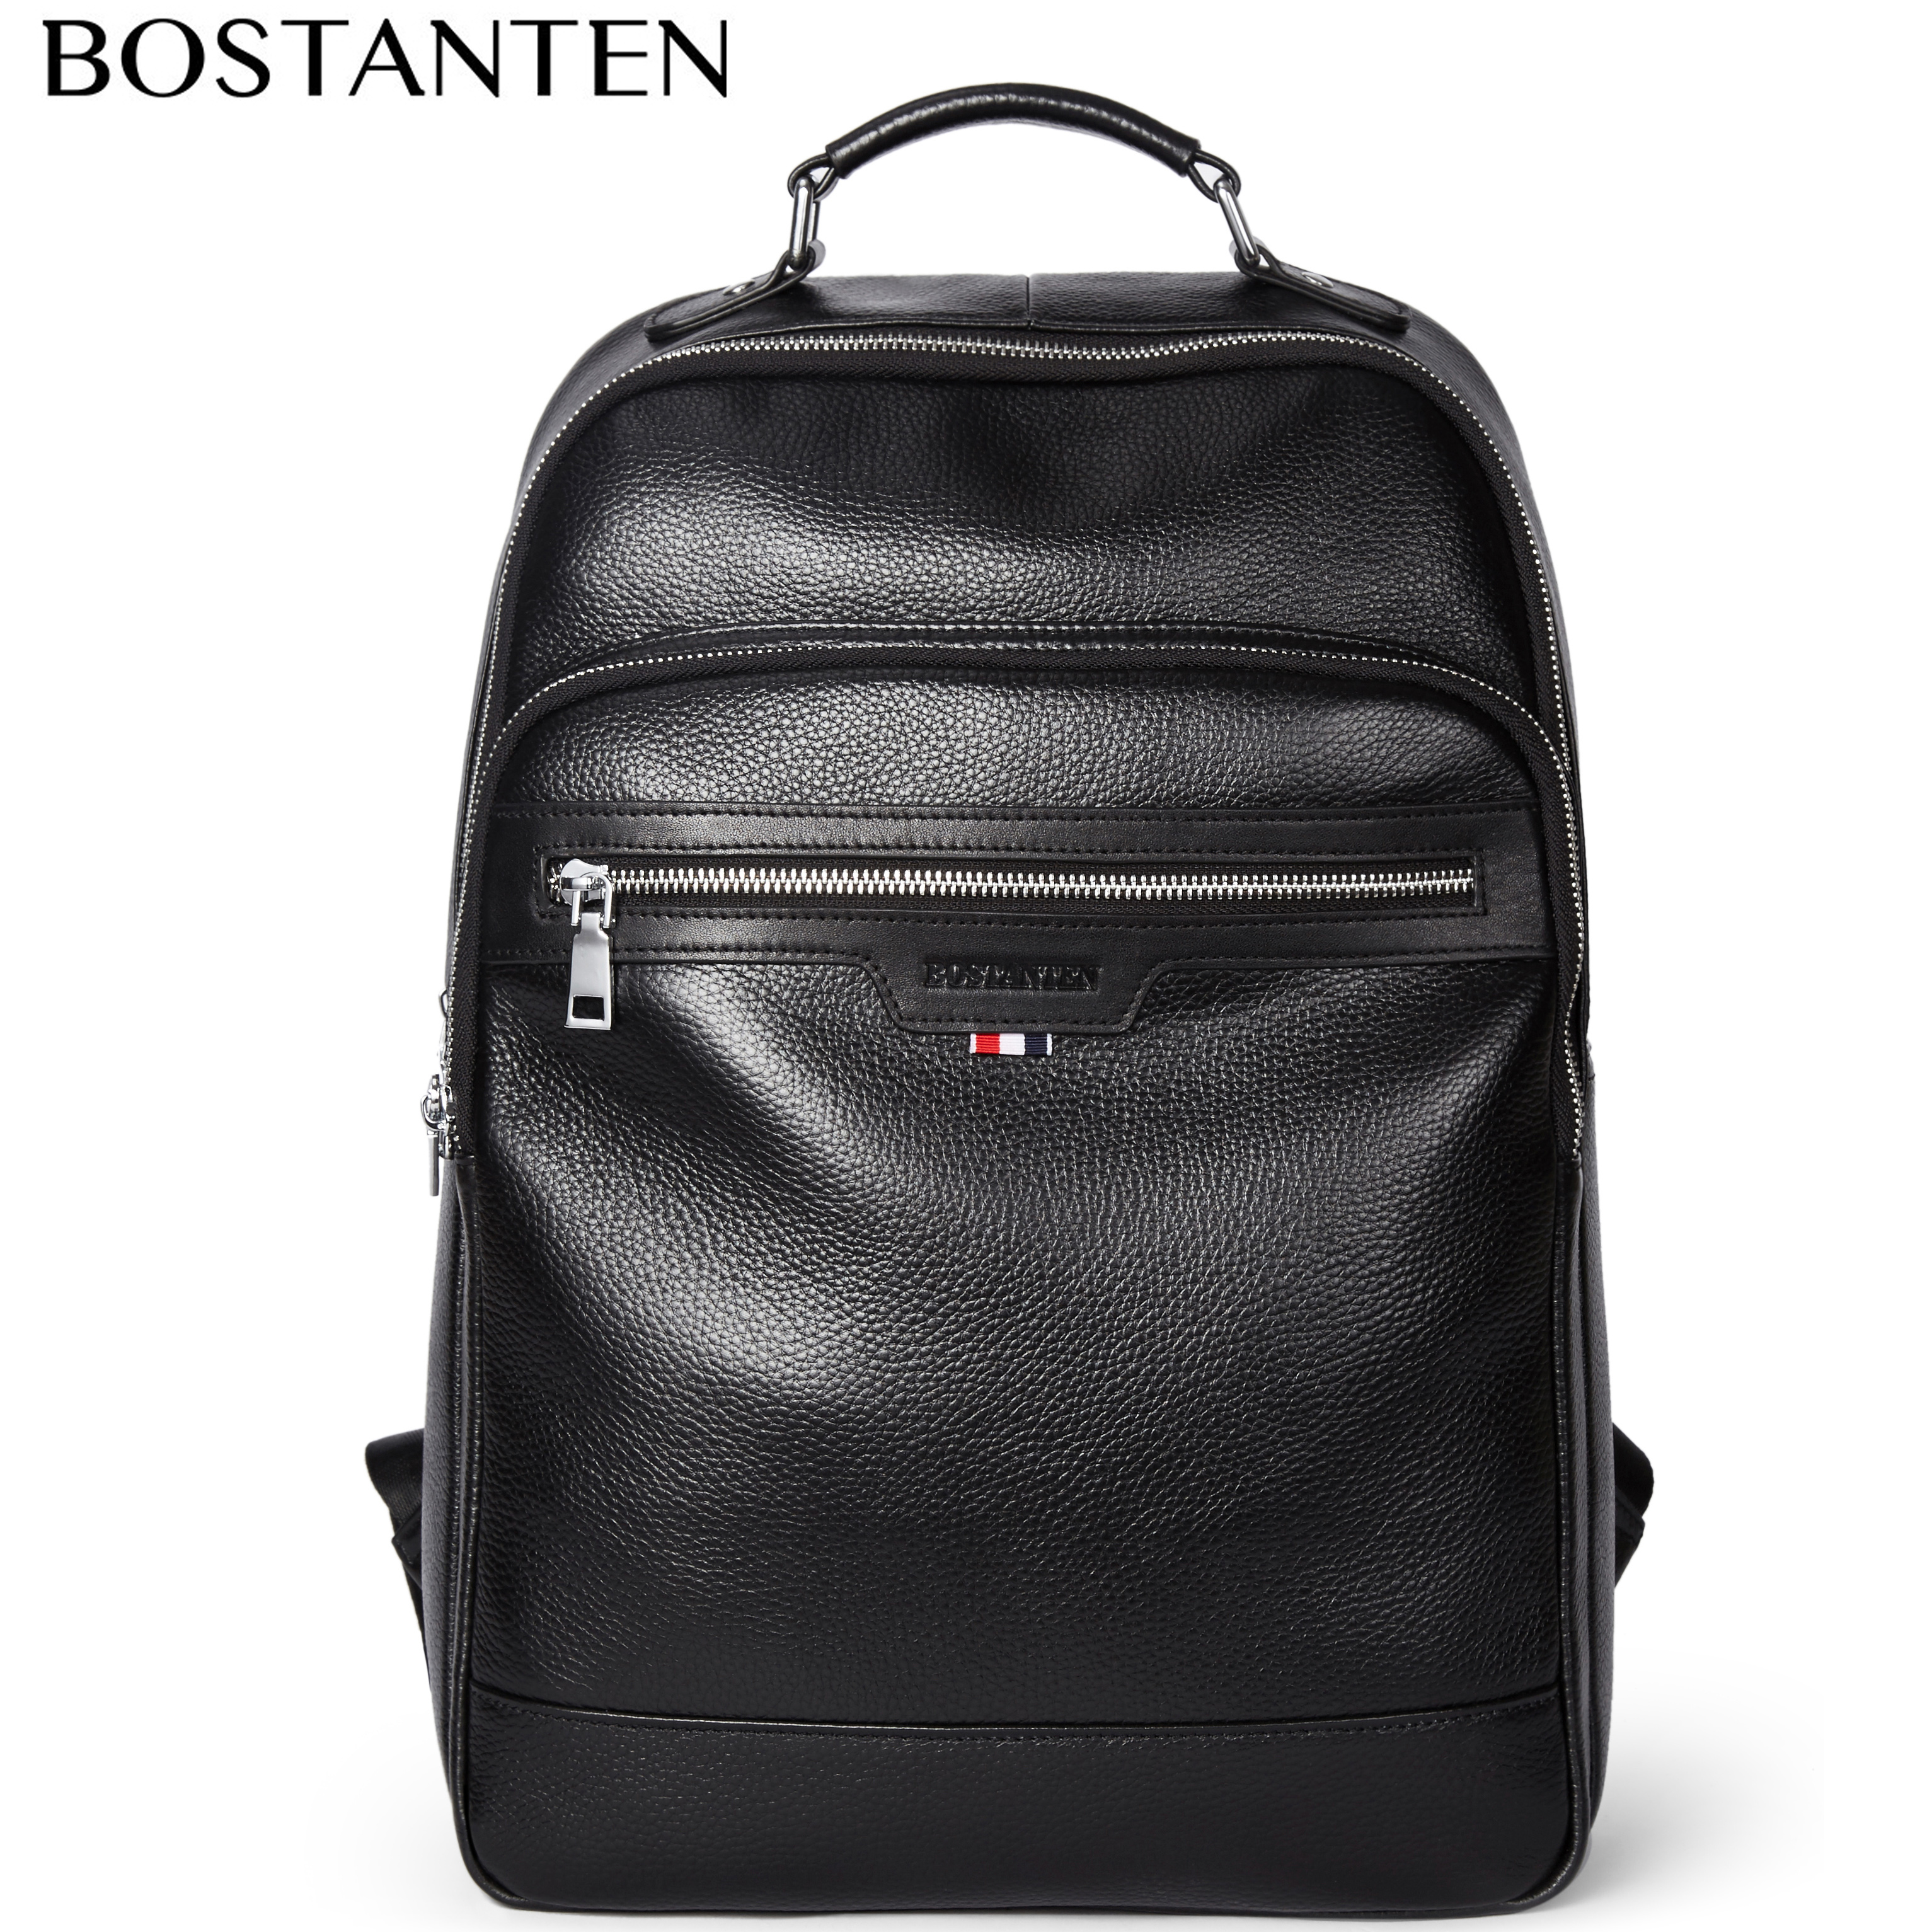 New Large Travel Backpack Teenagers School Book Bag Cowhide Genuine Leather Male Leisure Bag Men Laptop 14